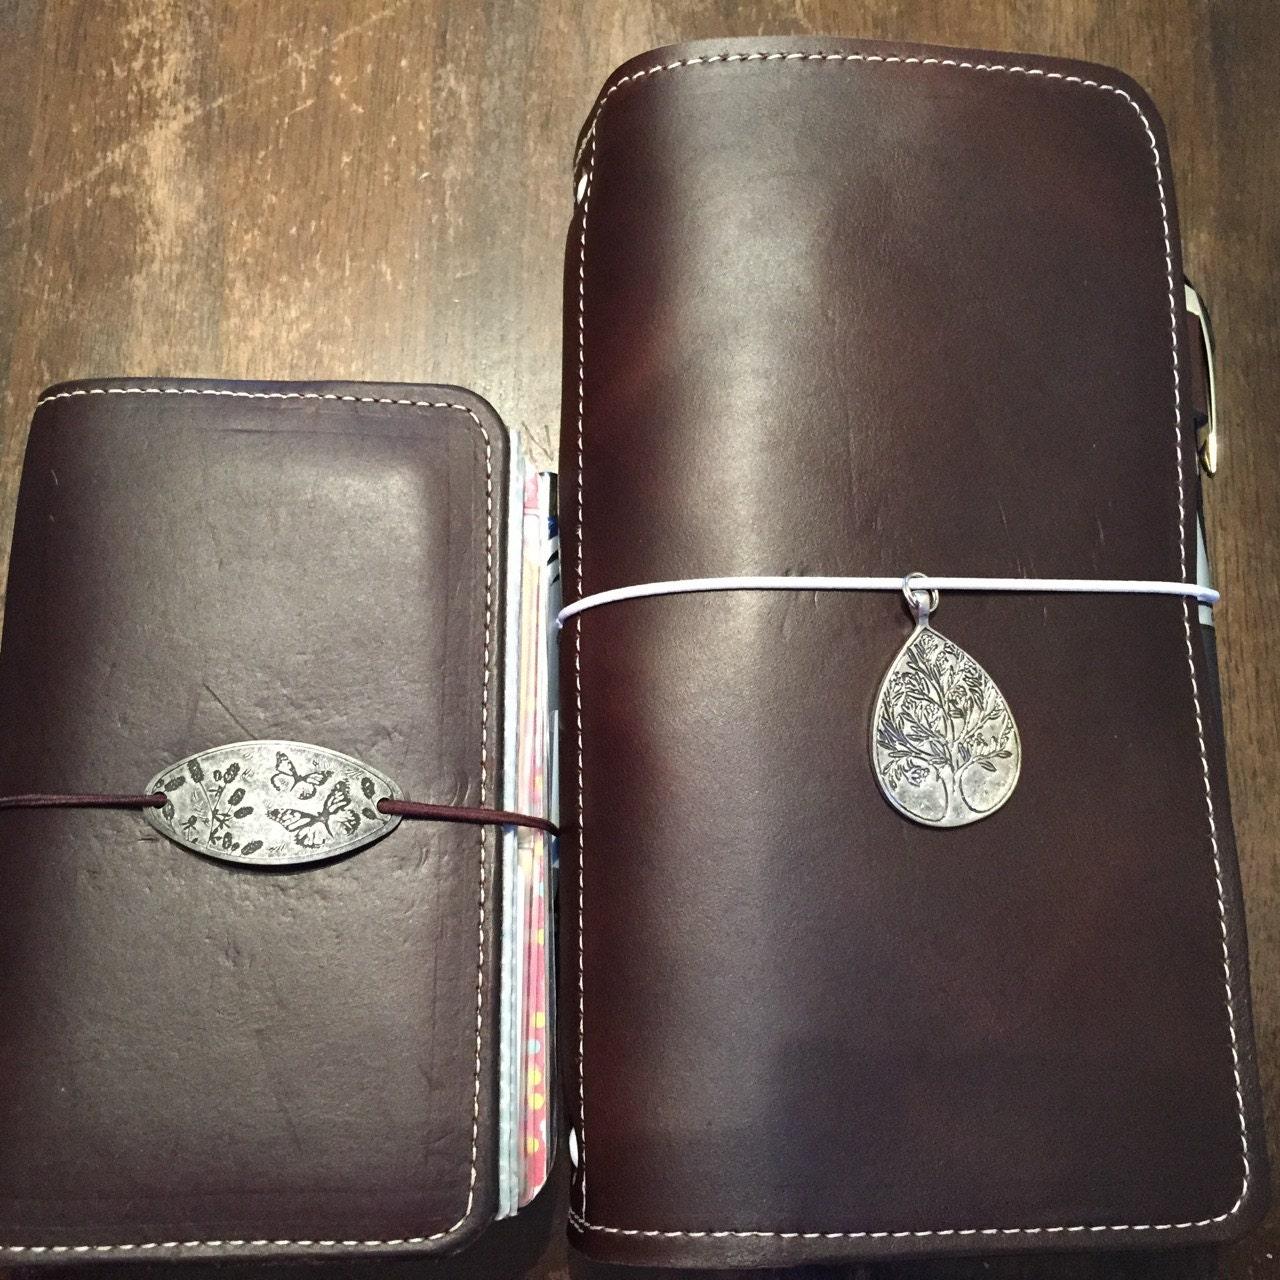 Rebecca Cruz-Brito added a photo of their purchase